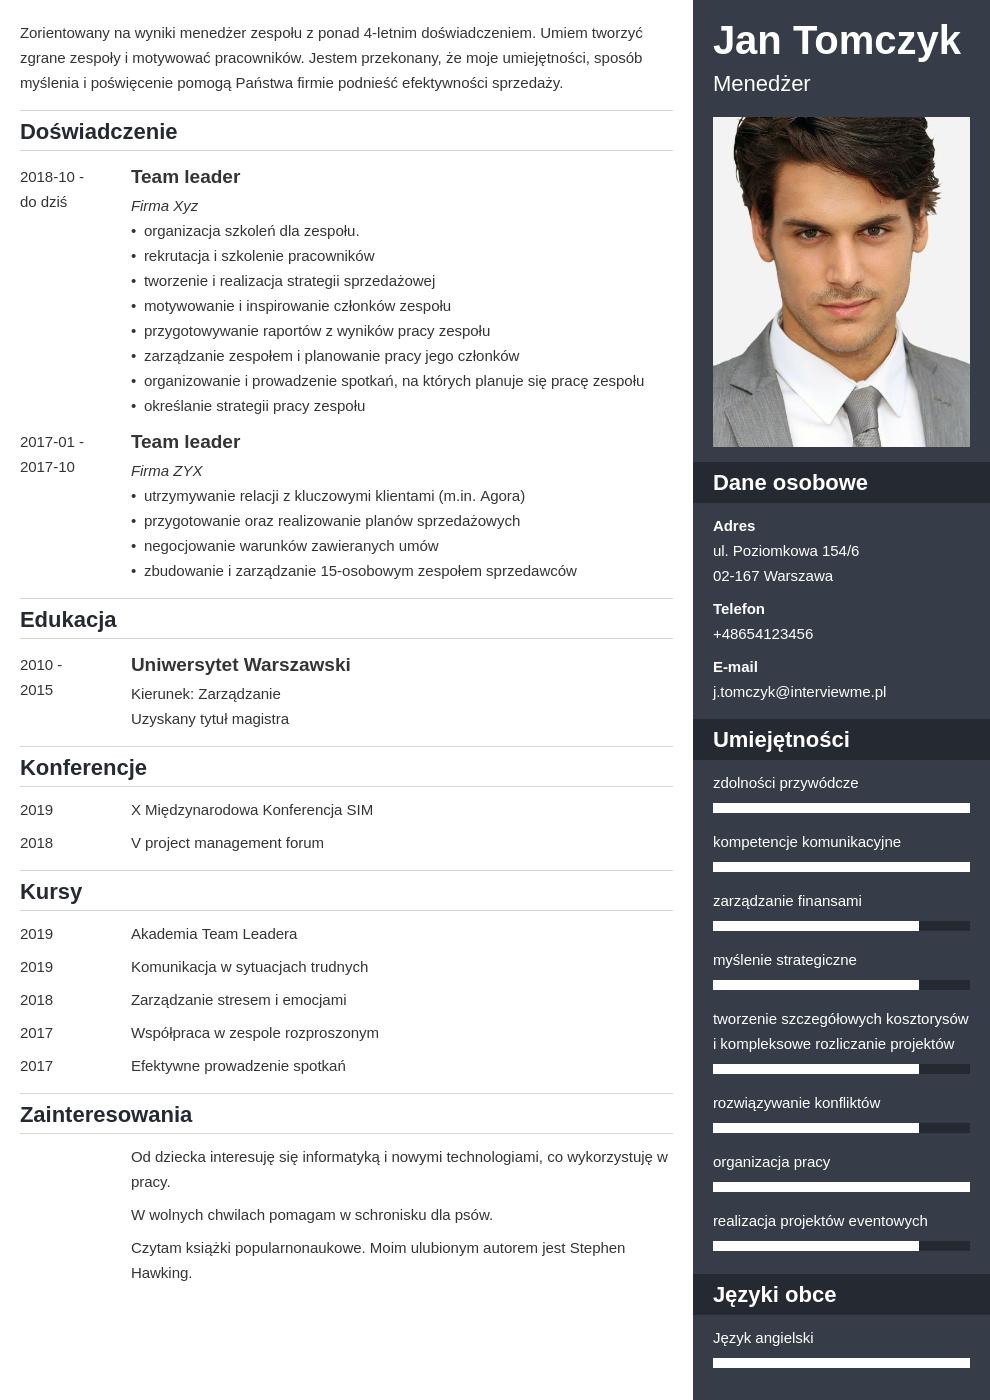 cv list motywacyjny managera template enfold